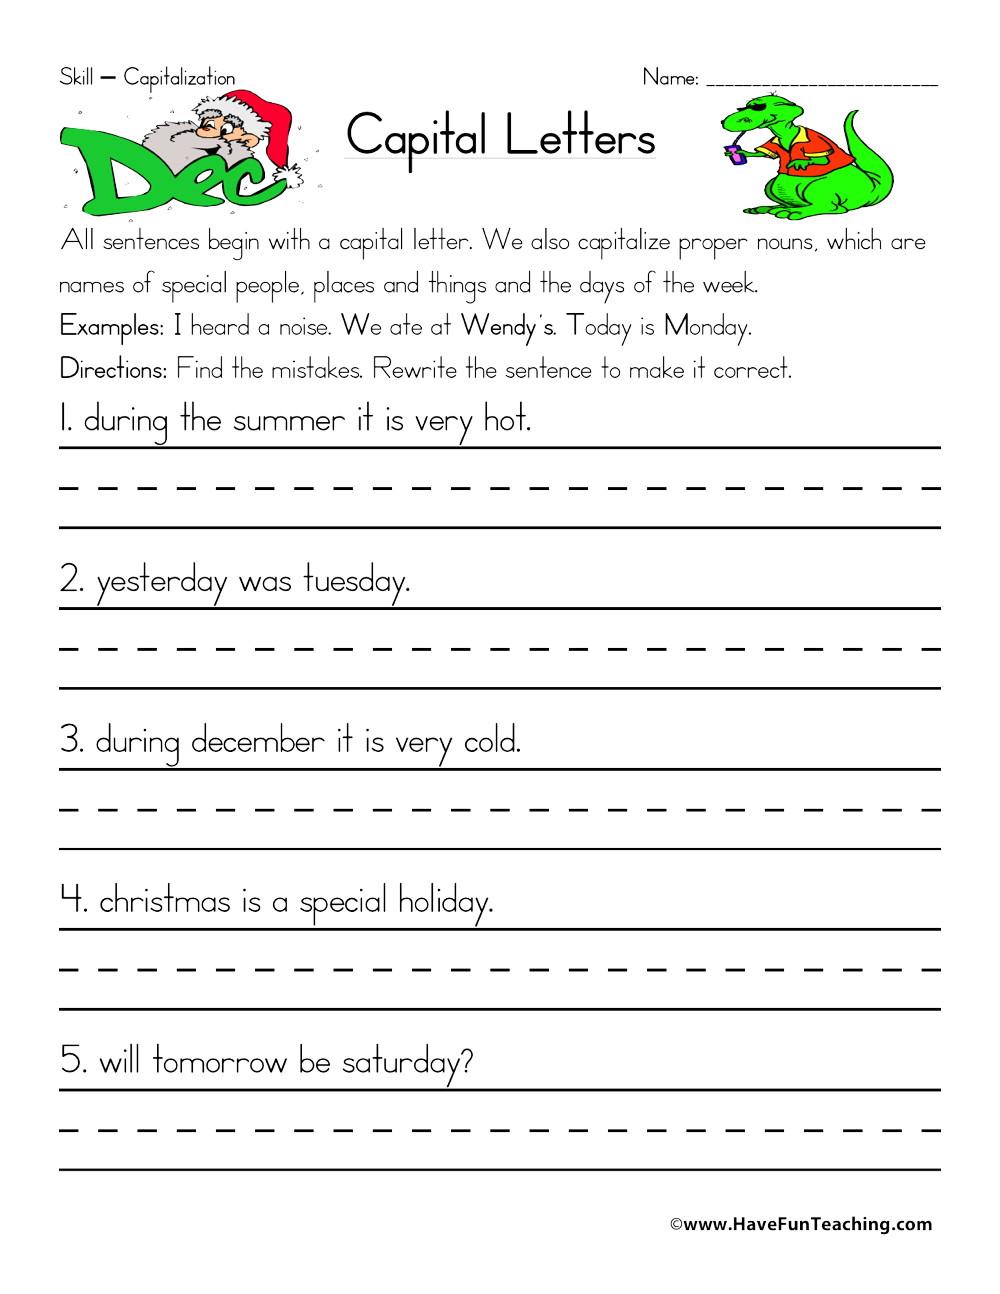 Capitalization Worksheets for 2nd Grade Rewriting Capitalization Worksheet